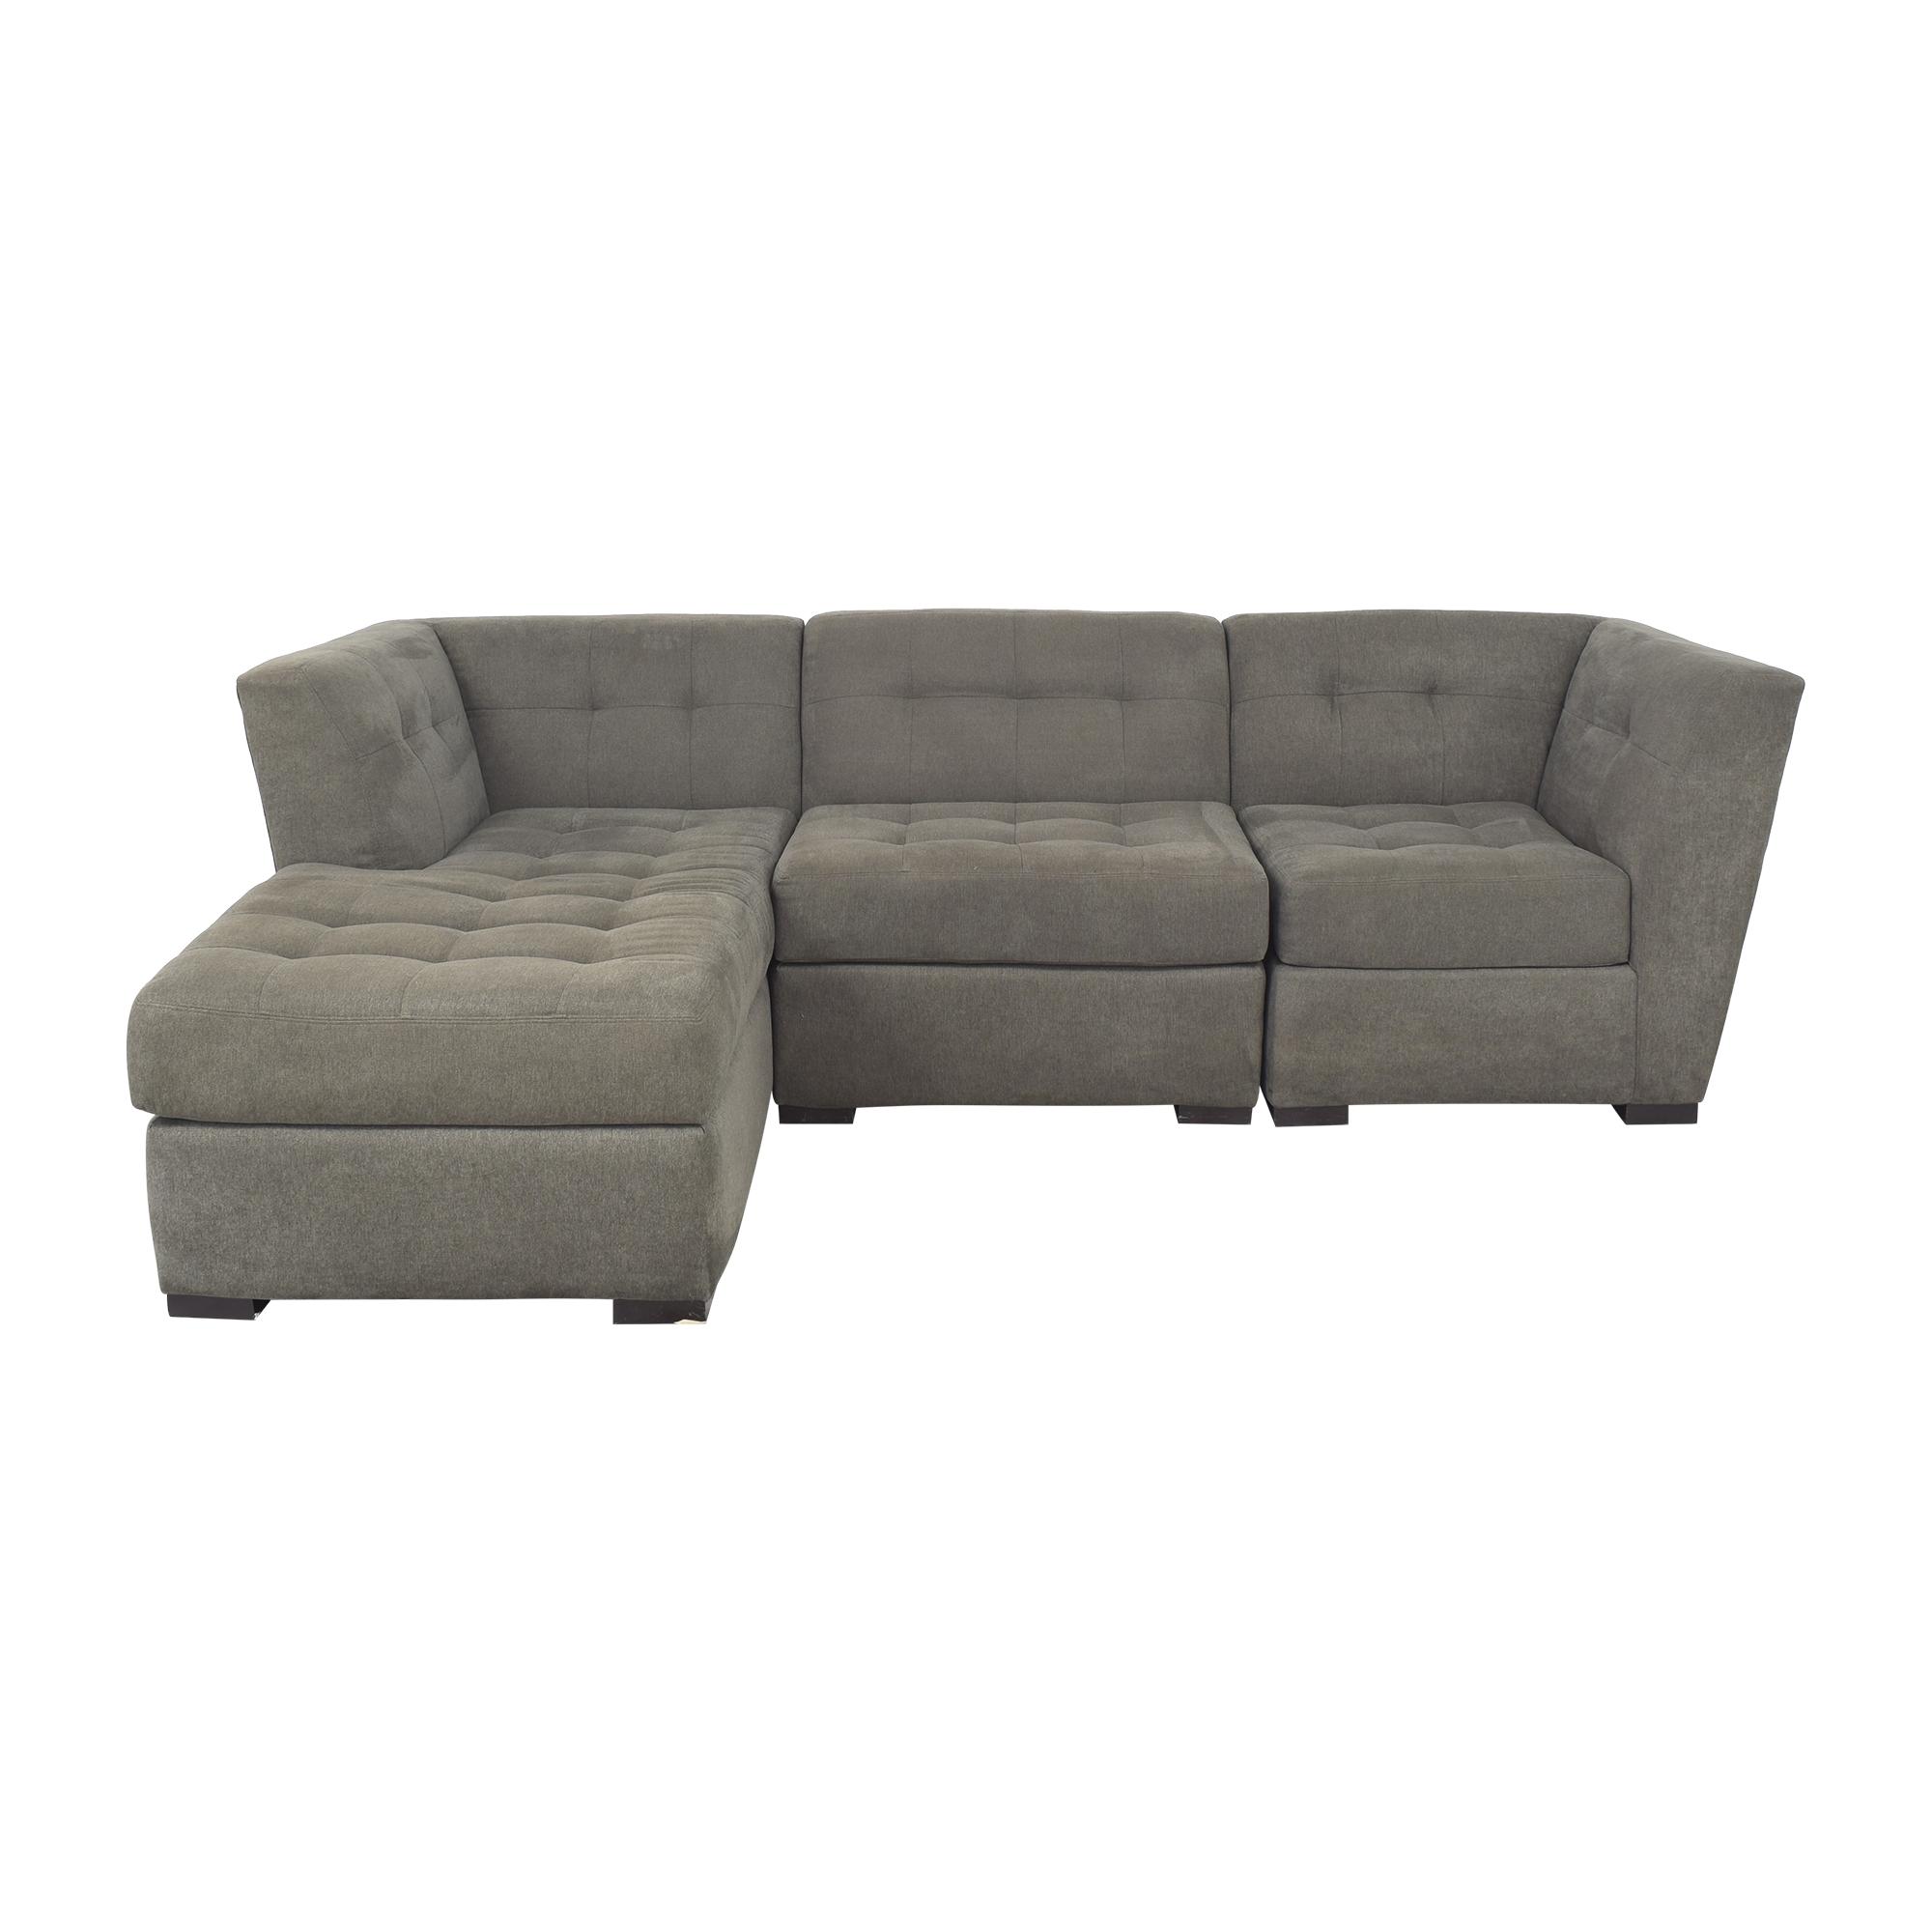 Macy's Roxanne II Chaise Sectional Sofa Macy's